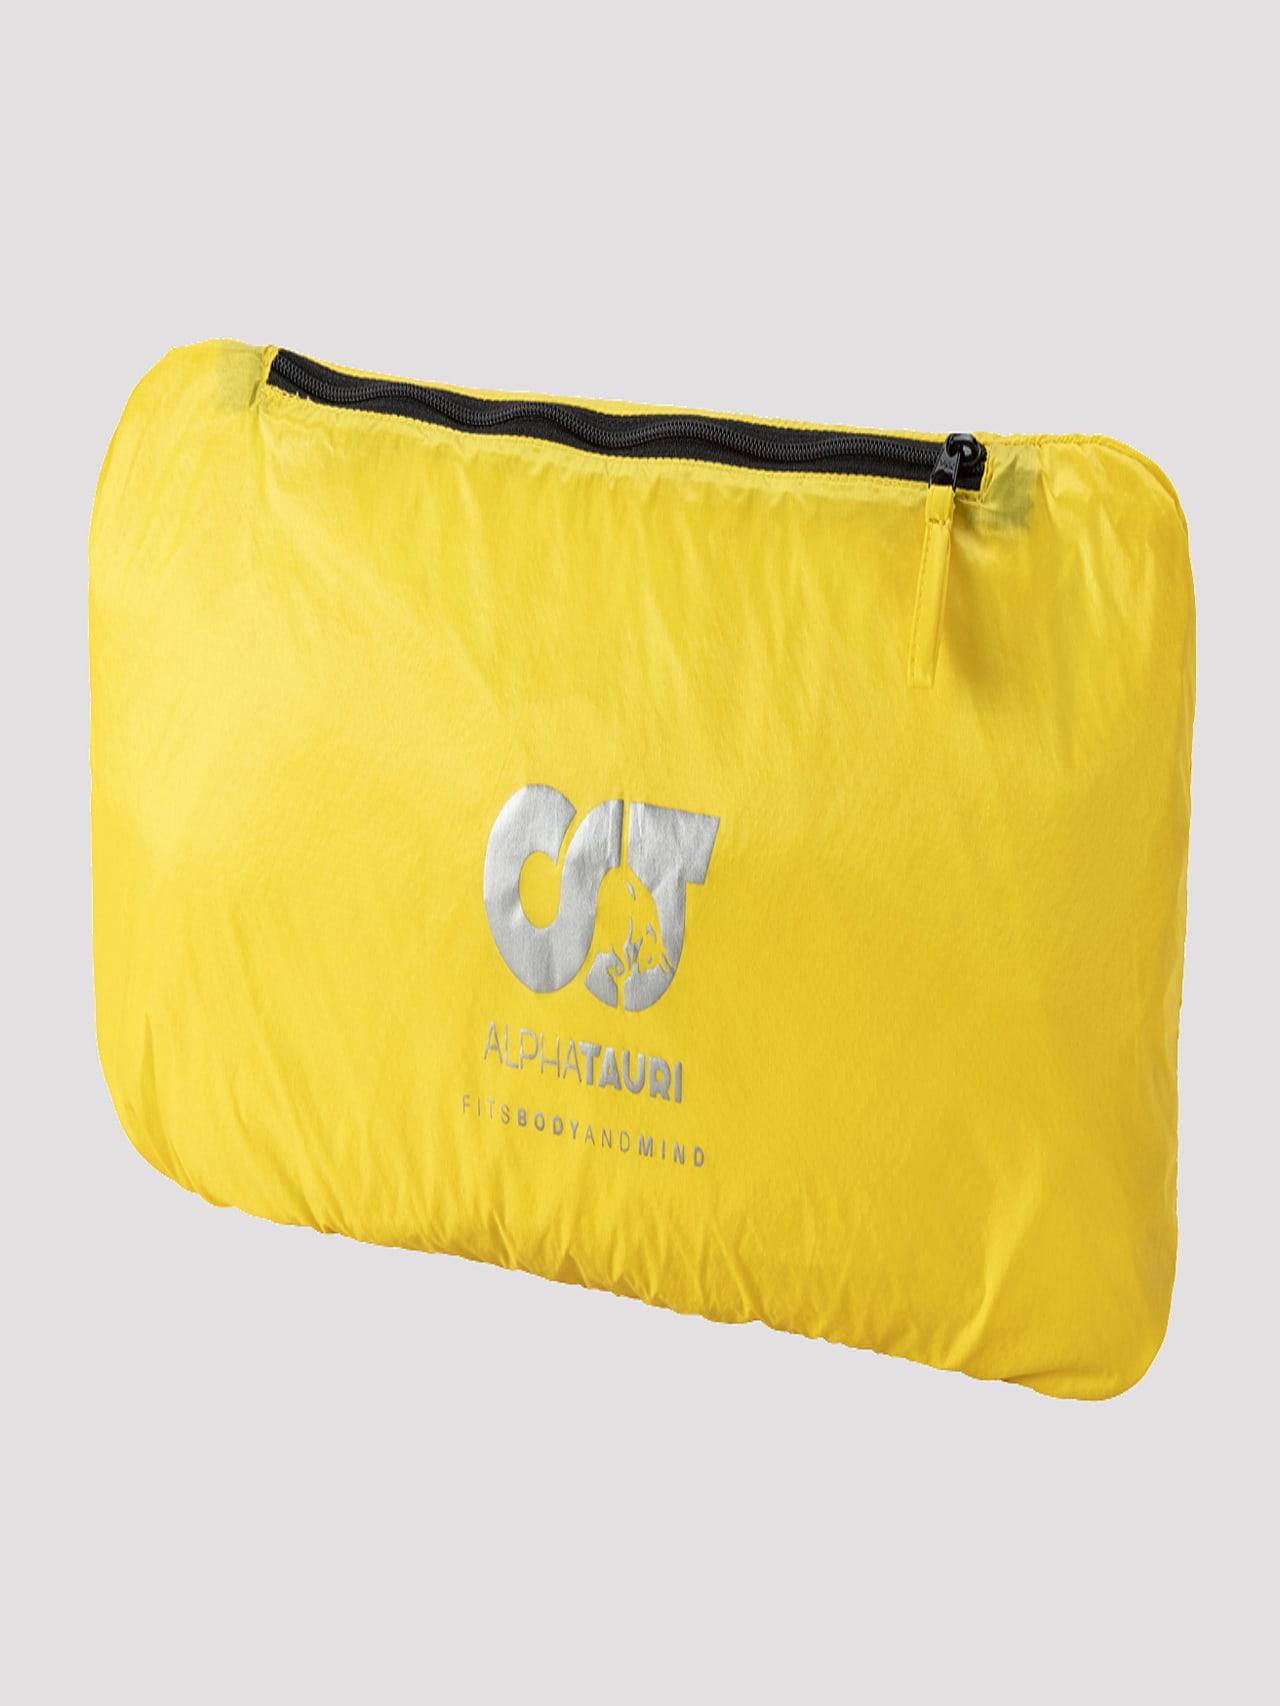 OLONO V2.Y5.01 Packable Windbreaker Coat yellow scene7.view.9.name Alpha Tauri